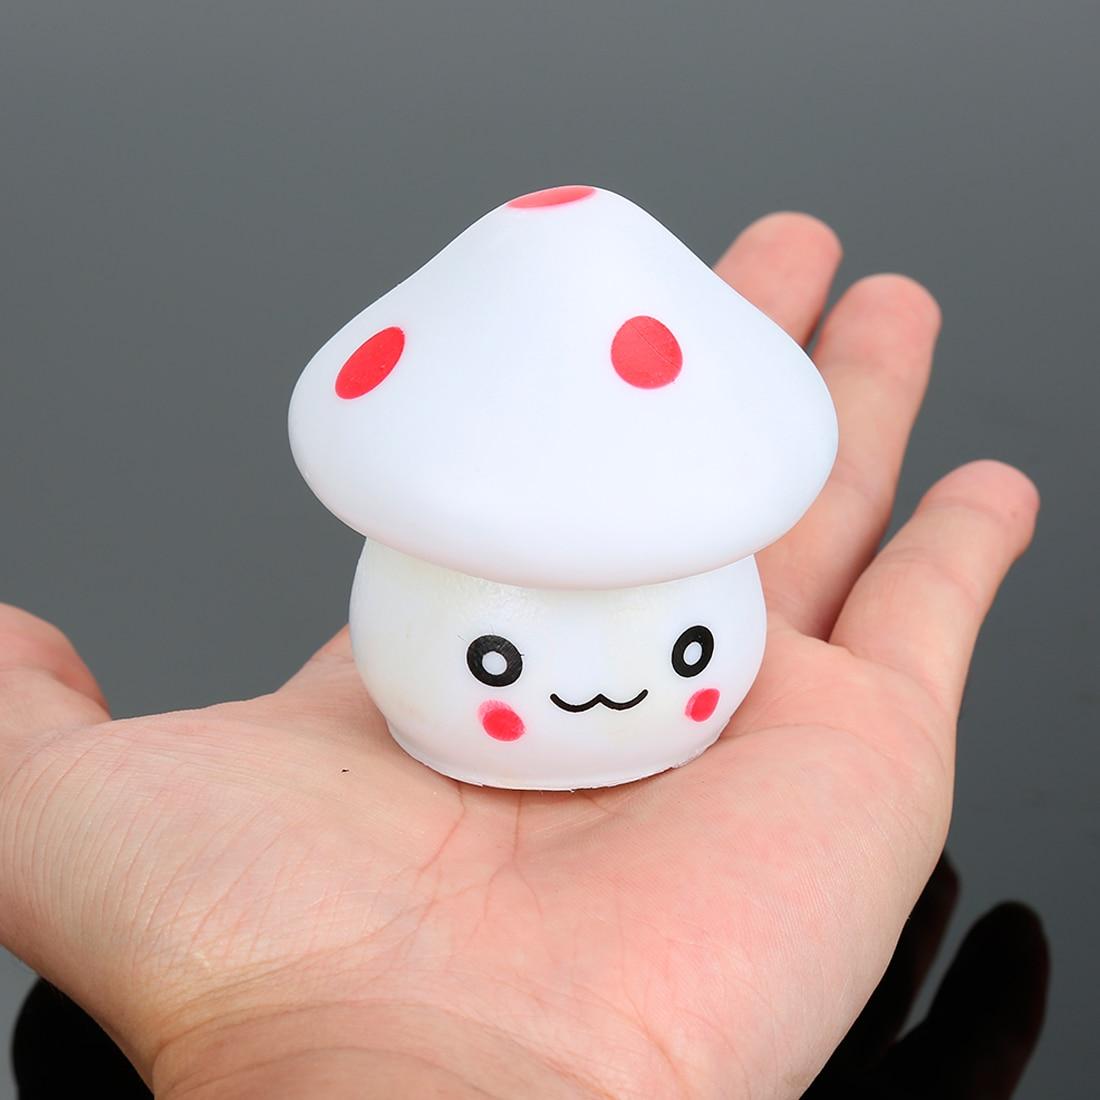 7 Color Changing LED Mushroom Lamp Party Lights Mini Soft Baby Child Sleeping Nightlight Novelty Luminous Toy Gift